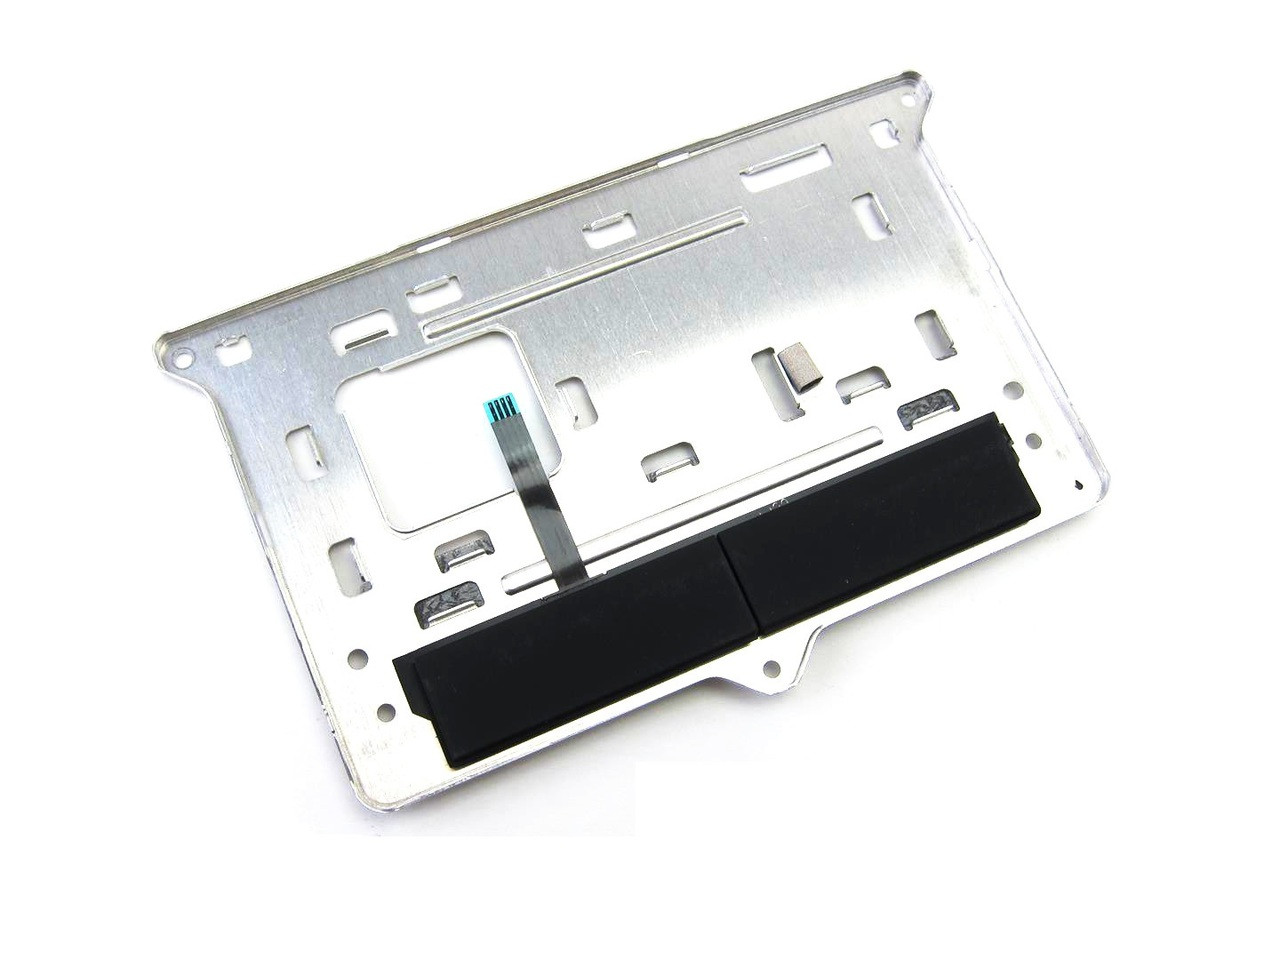 Alienware 15 R1 & R2 / 17 R1 / 18 R1 Mouse Buttons - JC1MH 0JC1MH